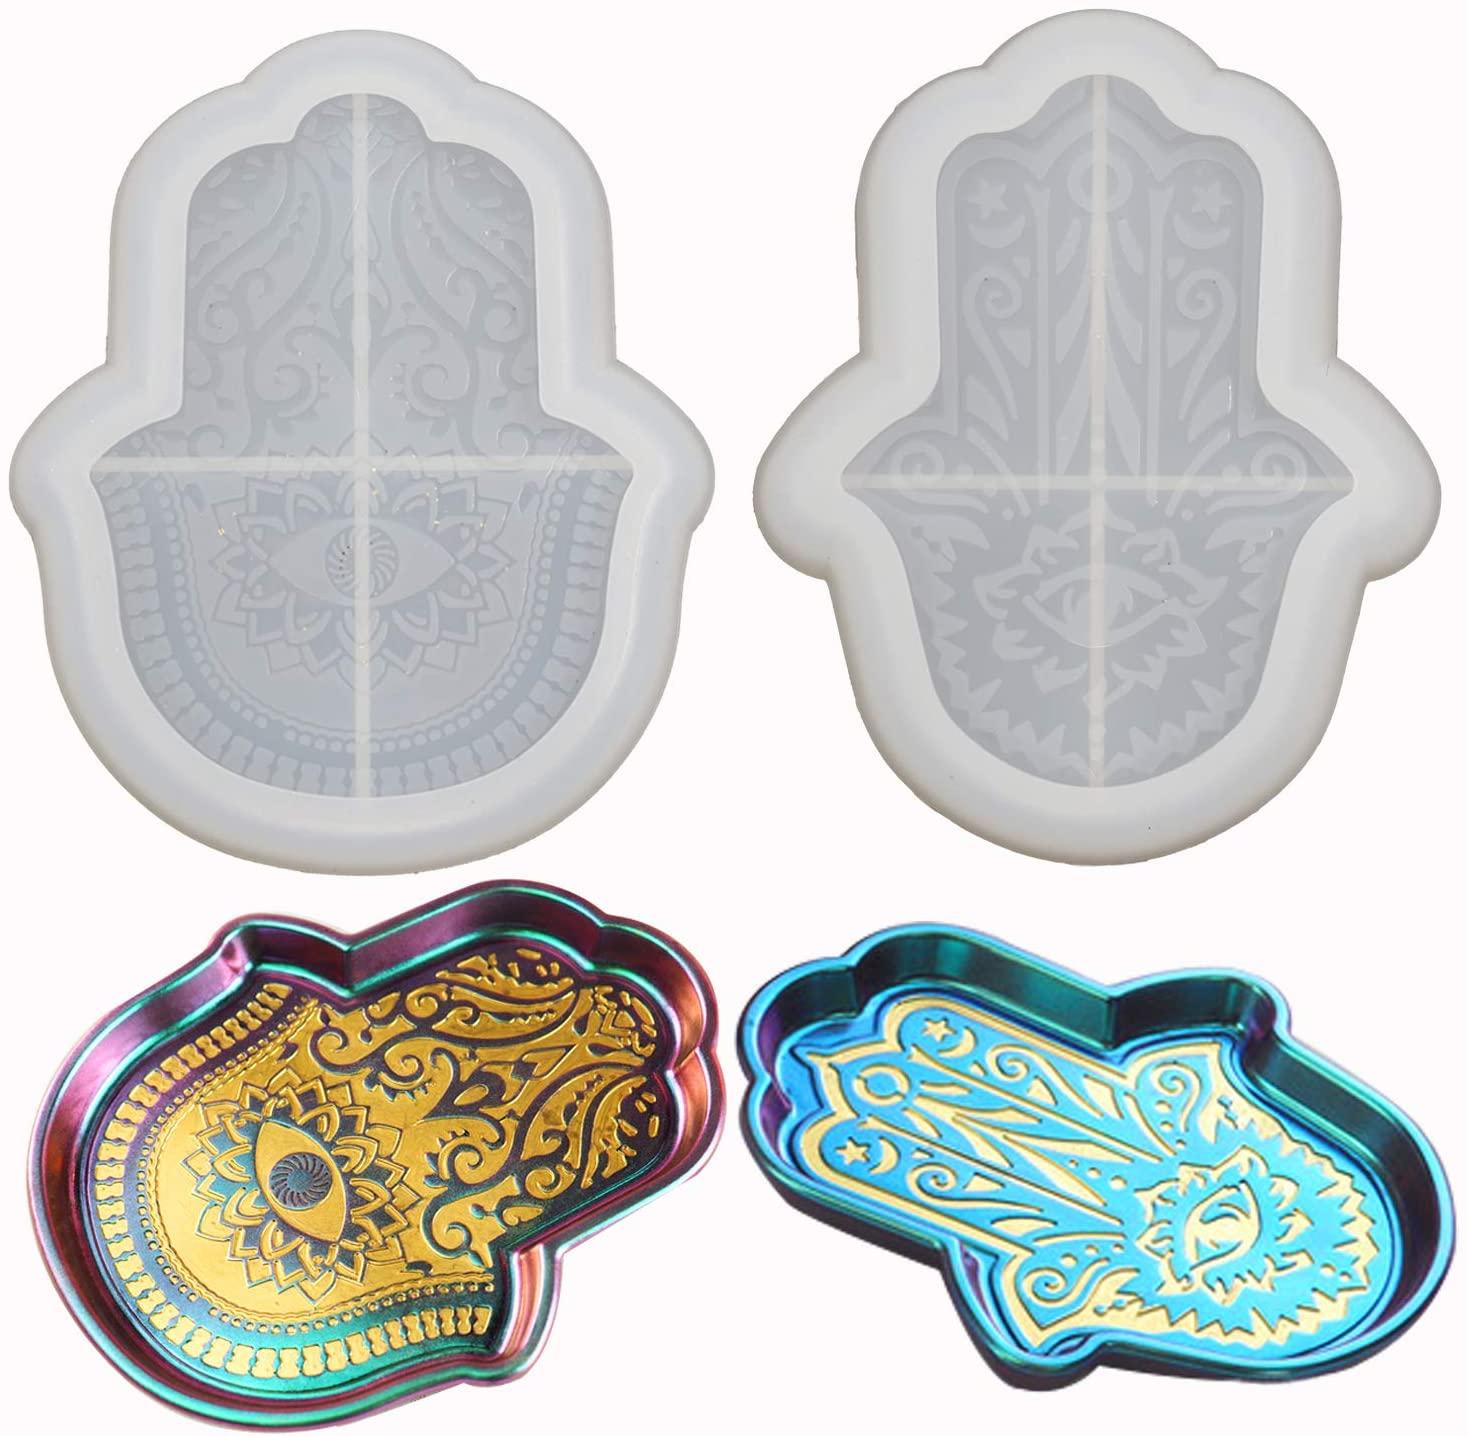 2PCS Hamsa Dish Resin Molds, Epoxy Plate Casting Mold for Soap Tray, Jewelry Tray, Home Decoration